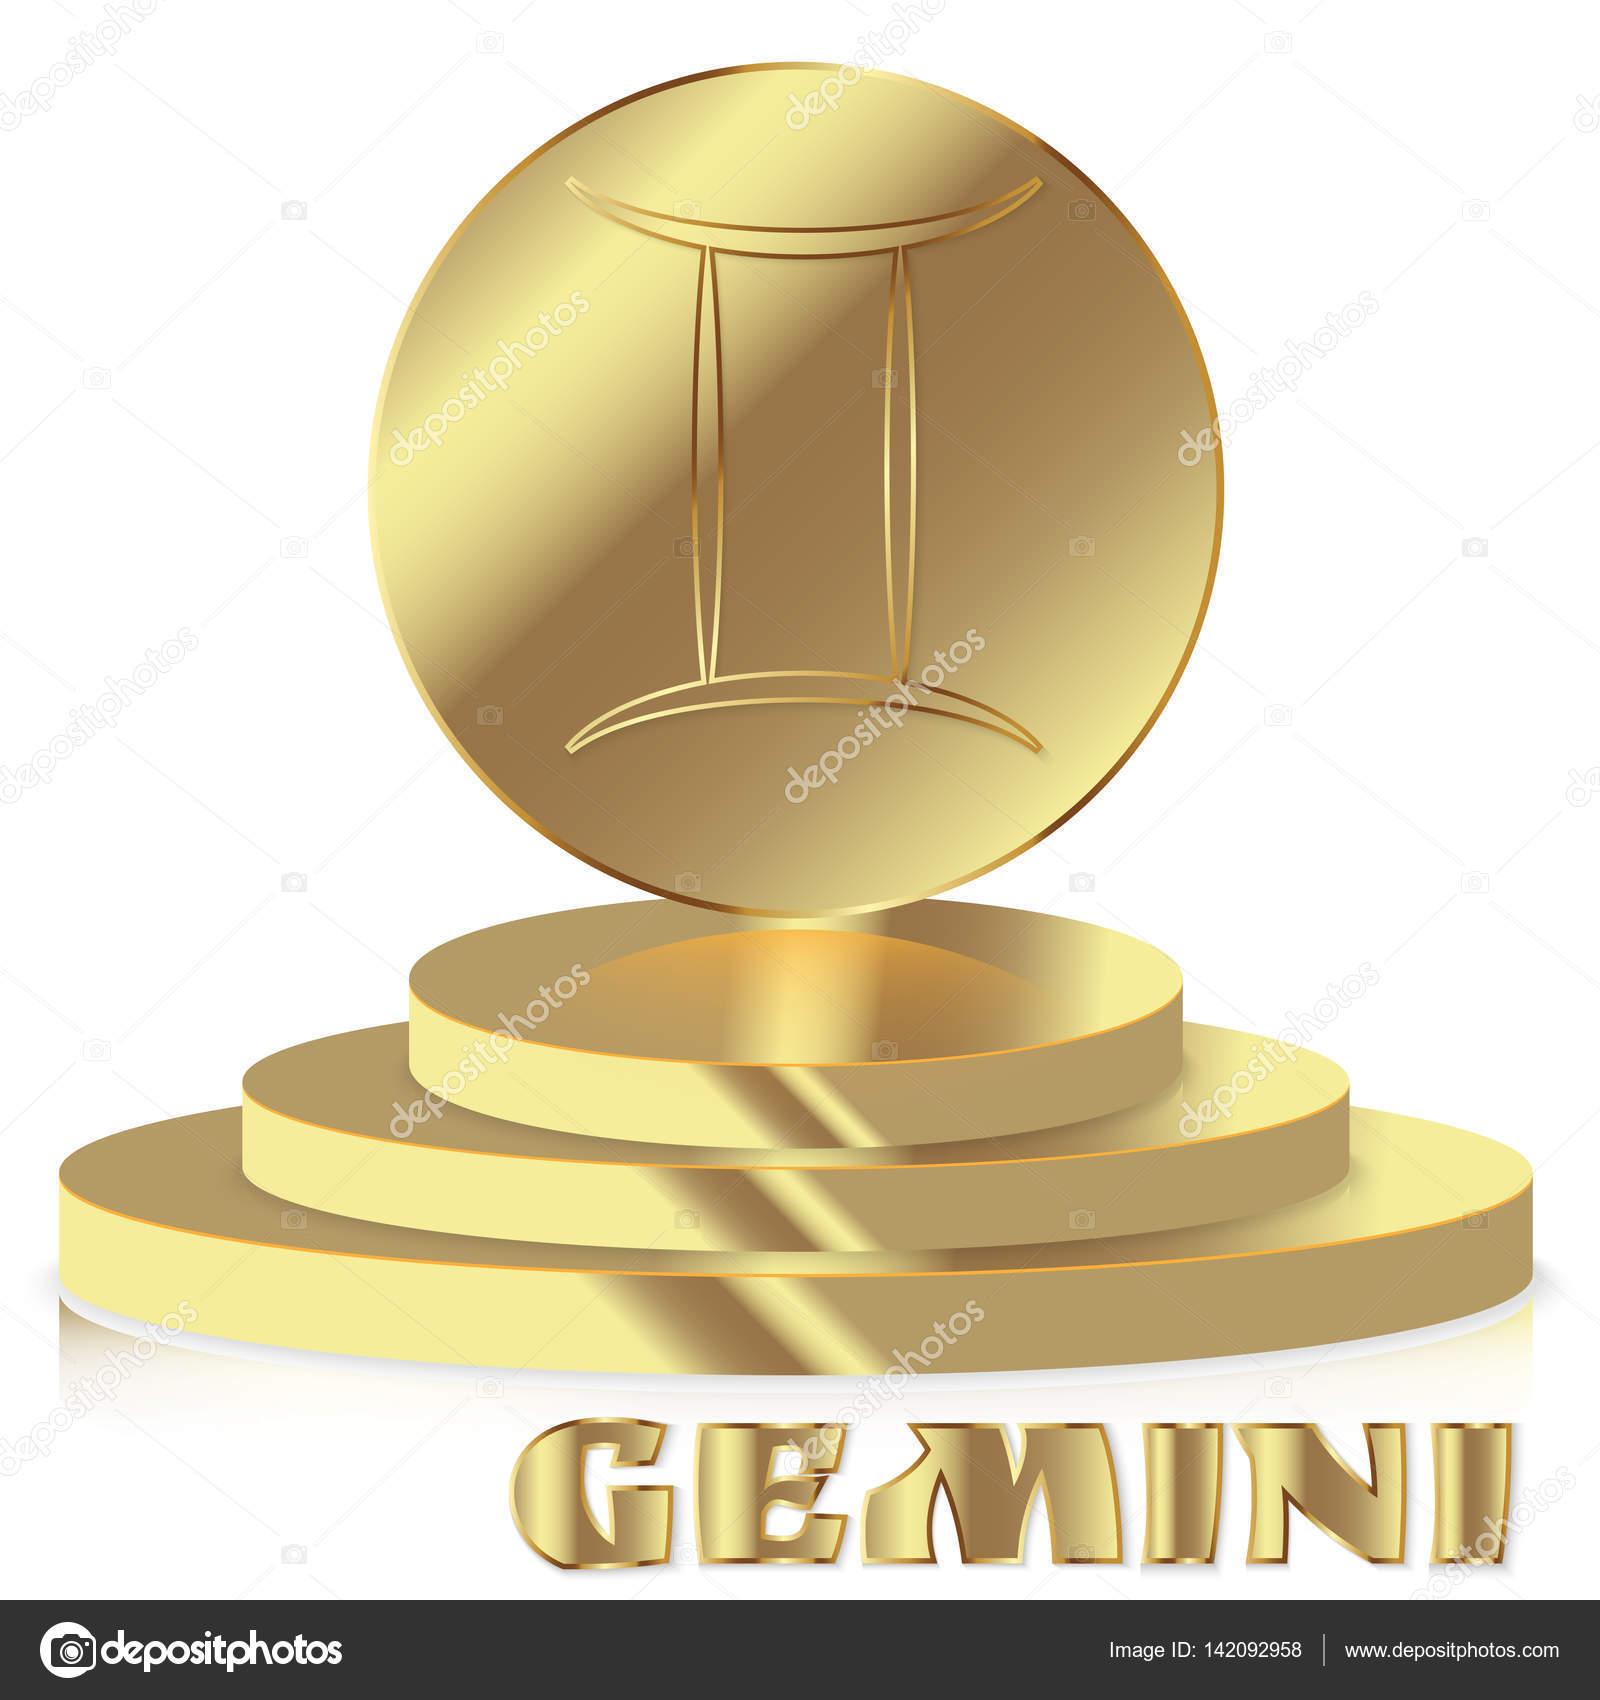 Gold Zodiac Sign Gemini Astrological And Horoscope Symbol Stock